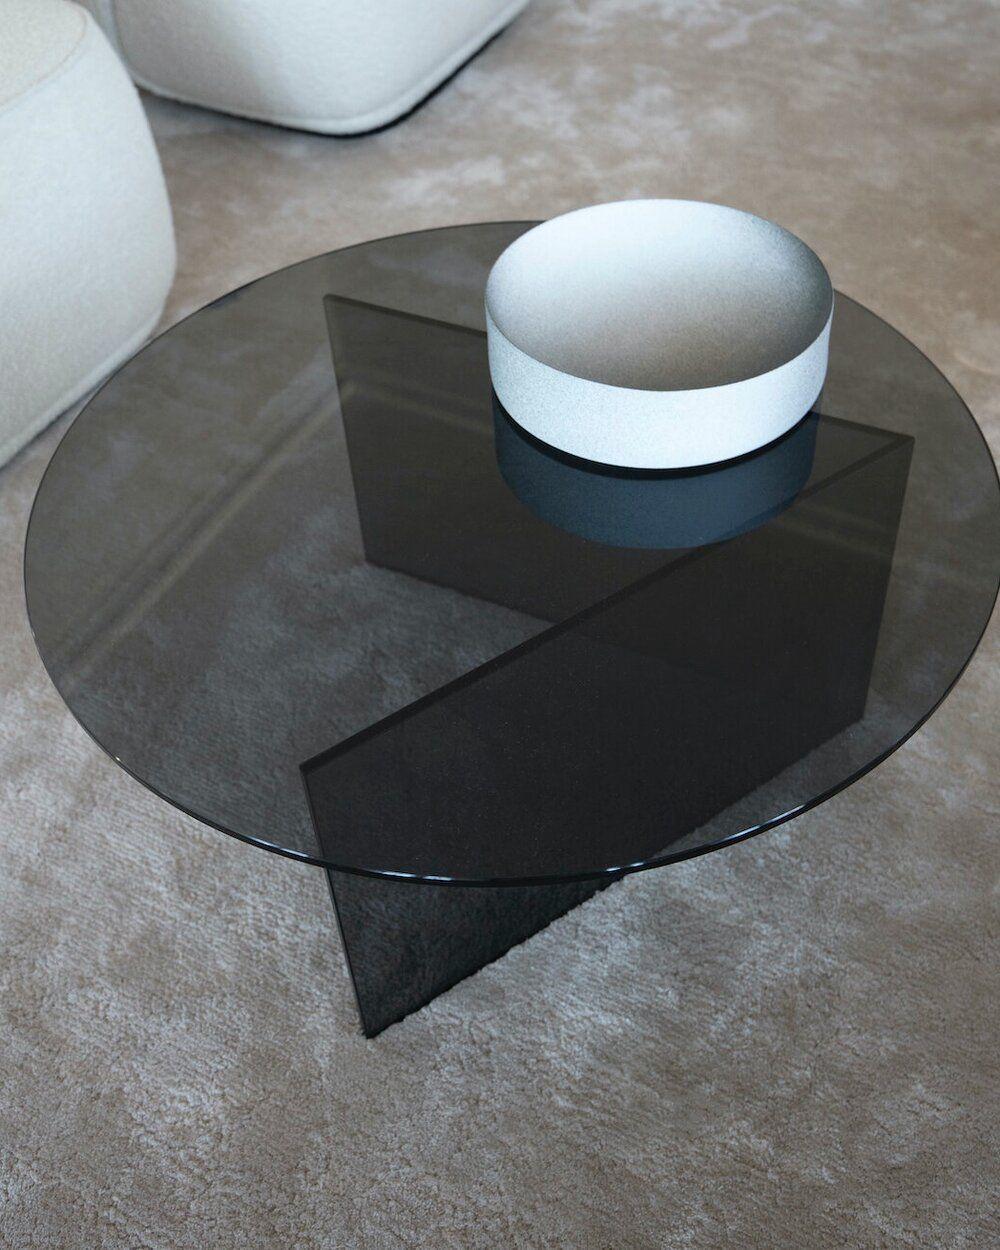 The Pond Coffee Table Gestalt New York Coffee Table Contemporary Coffee Table Perfect Coffee Table [ 1250 x 1000 Pixel ]